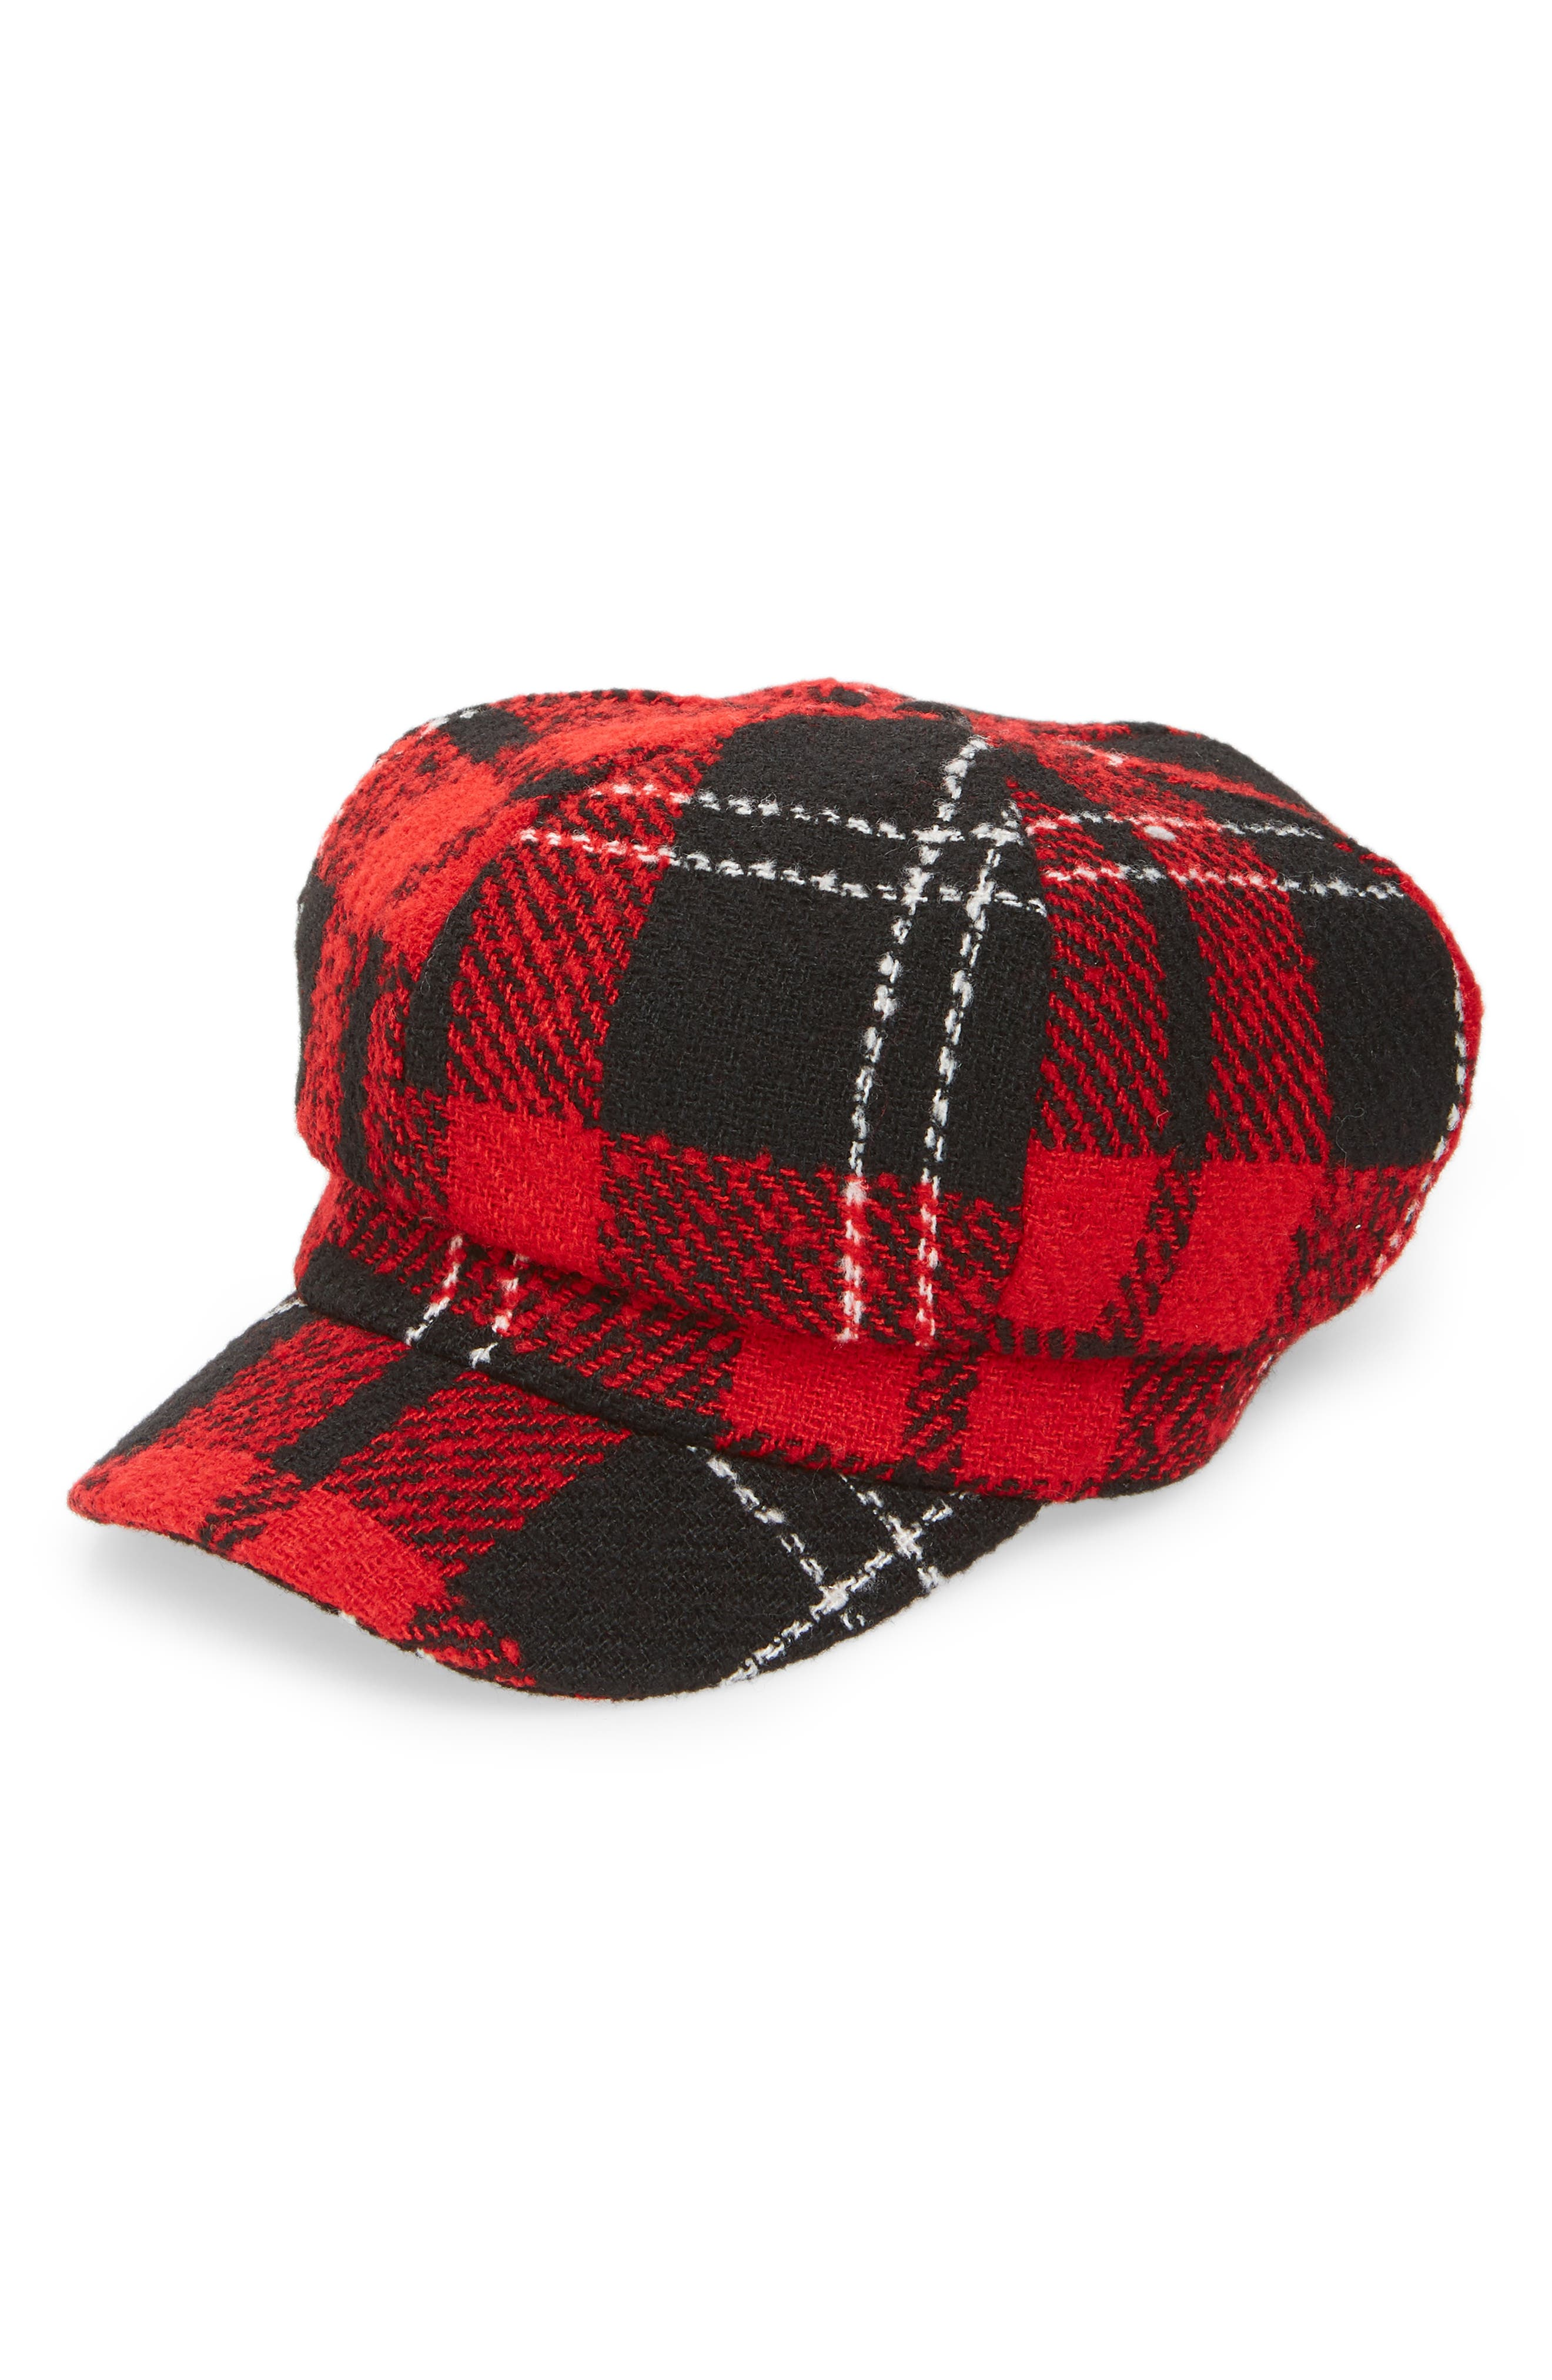 Lumberjack Baker Boy Hat,                             Main thumbnail 1, color,                             RED MULTI